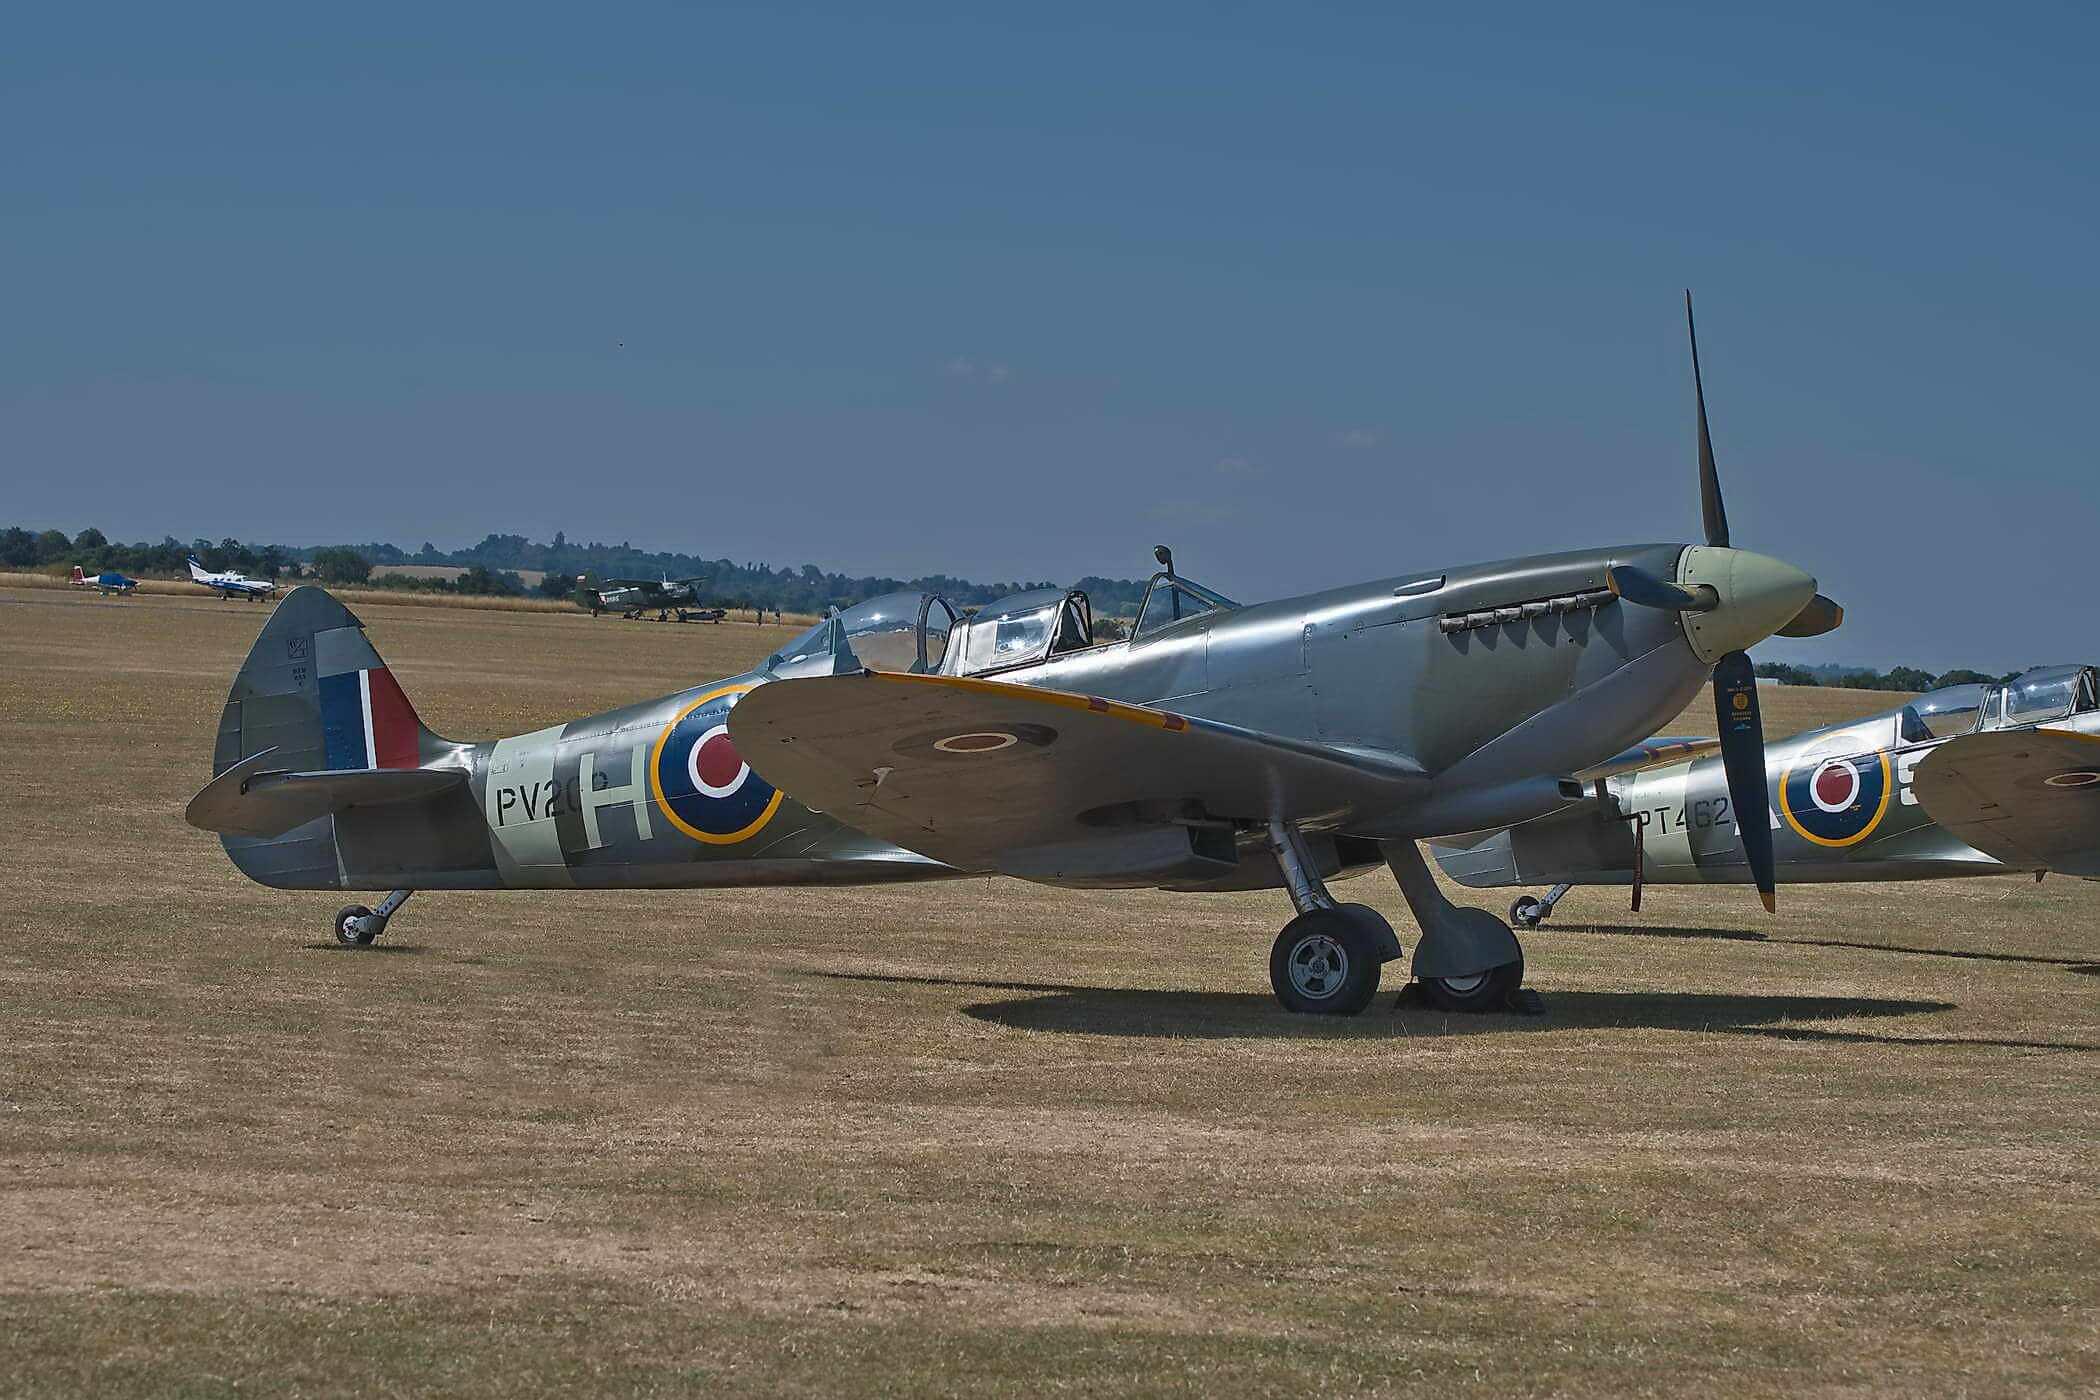 Spitfire TR 9 PV202